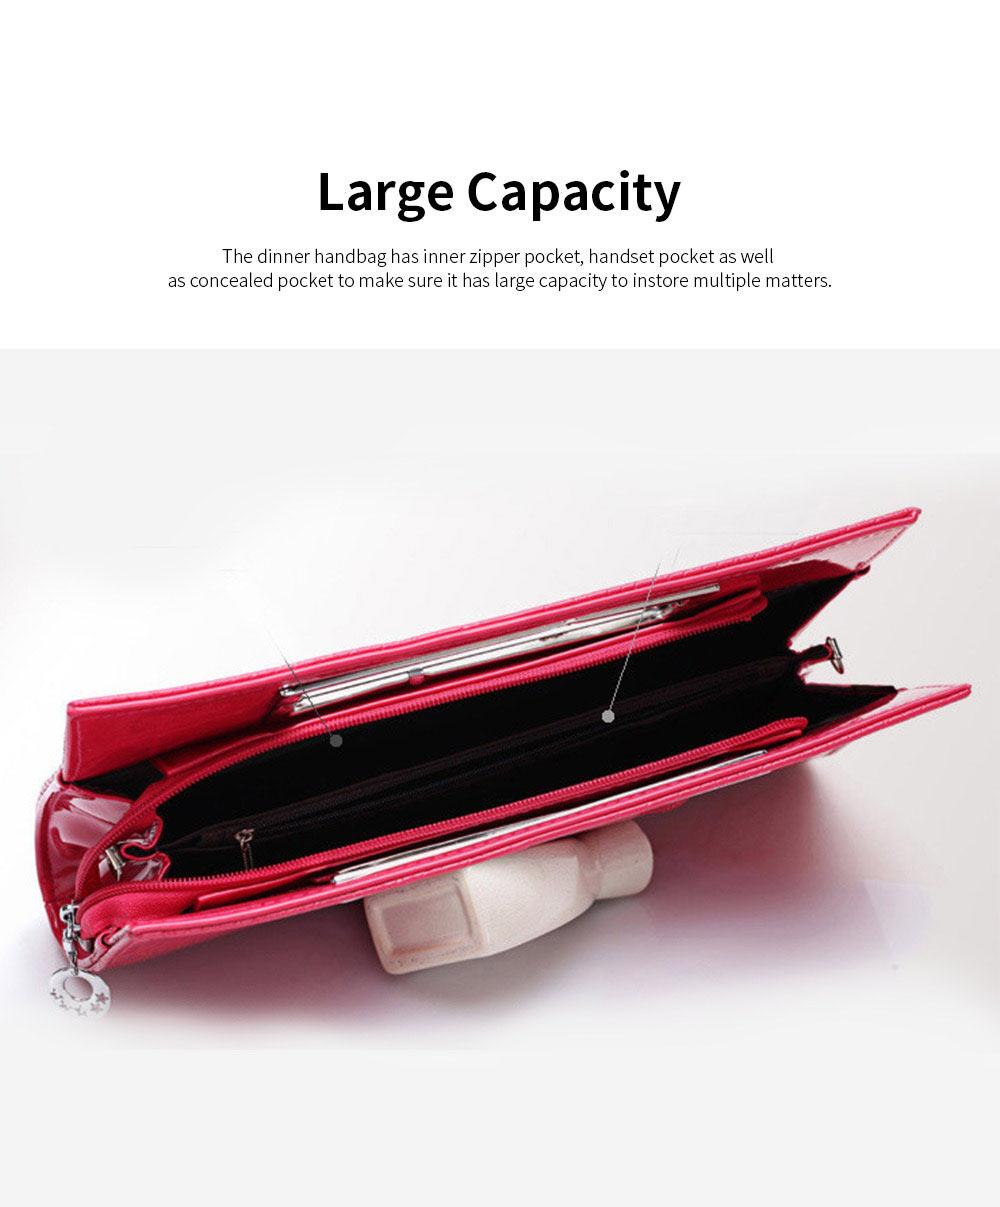 Women Evening Bag Casual PU Leather Dinner Bag with Removable Handle Zipper Pocket Durable Wear Resistant Concealed Pocket Crocodile Pattern Handbag 5